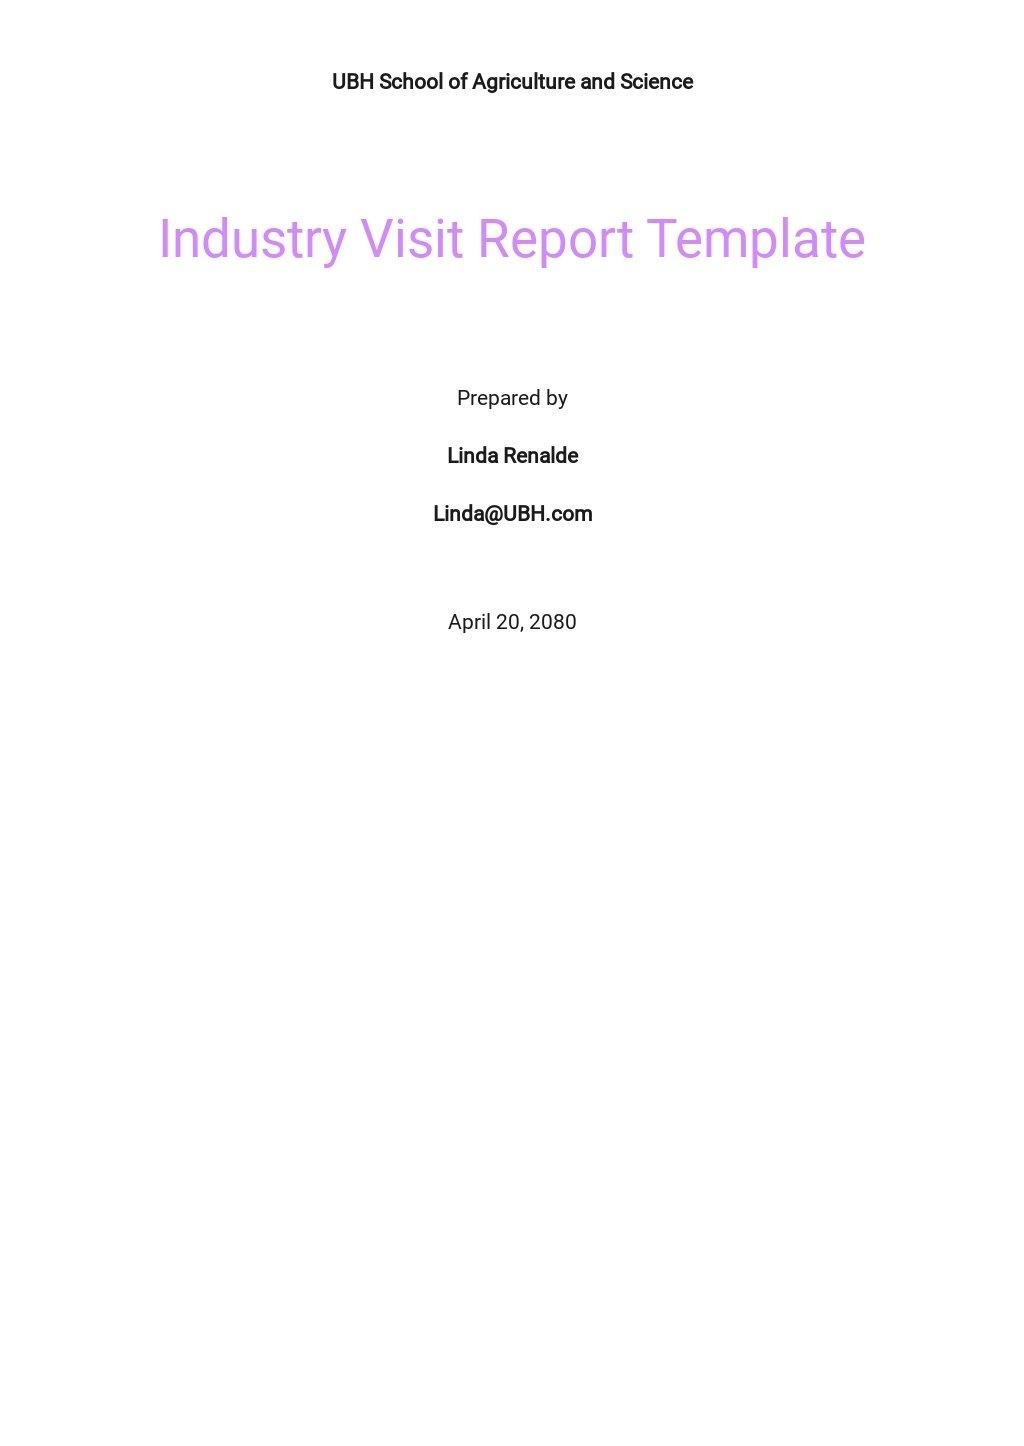 Free Industry Visit Report Template.jpe